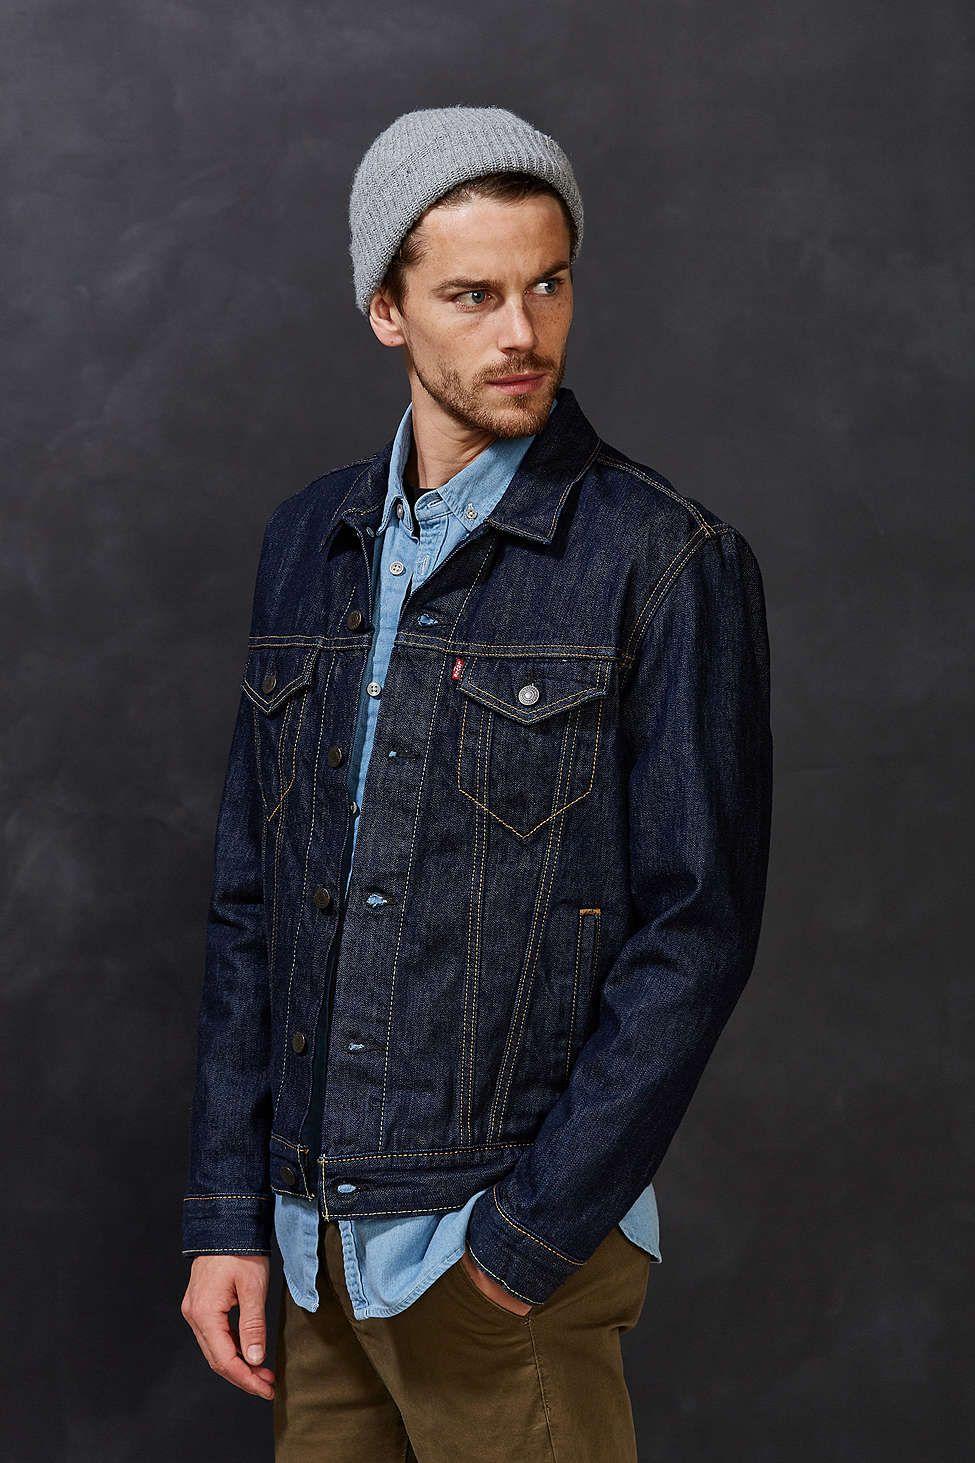 Urbnite Jean Jacket Outfits Men Dark Blue Denim Jacket Jean Jacket Outfits [ 1463 x 975 Pixel ]